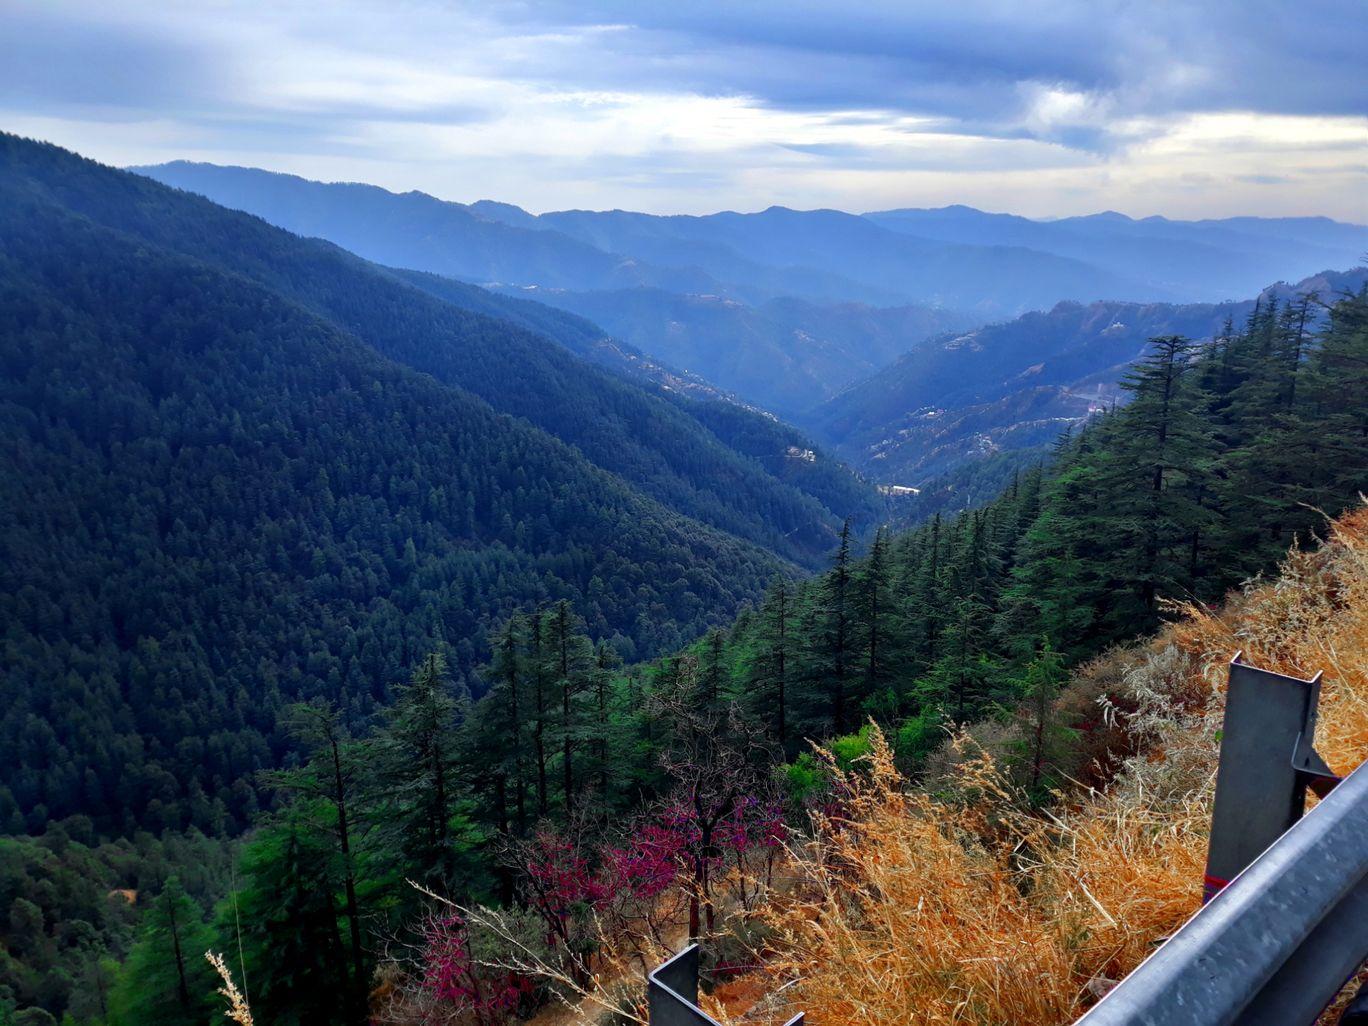 Photo of Shimla By Arjun Dhankar